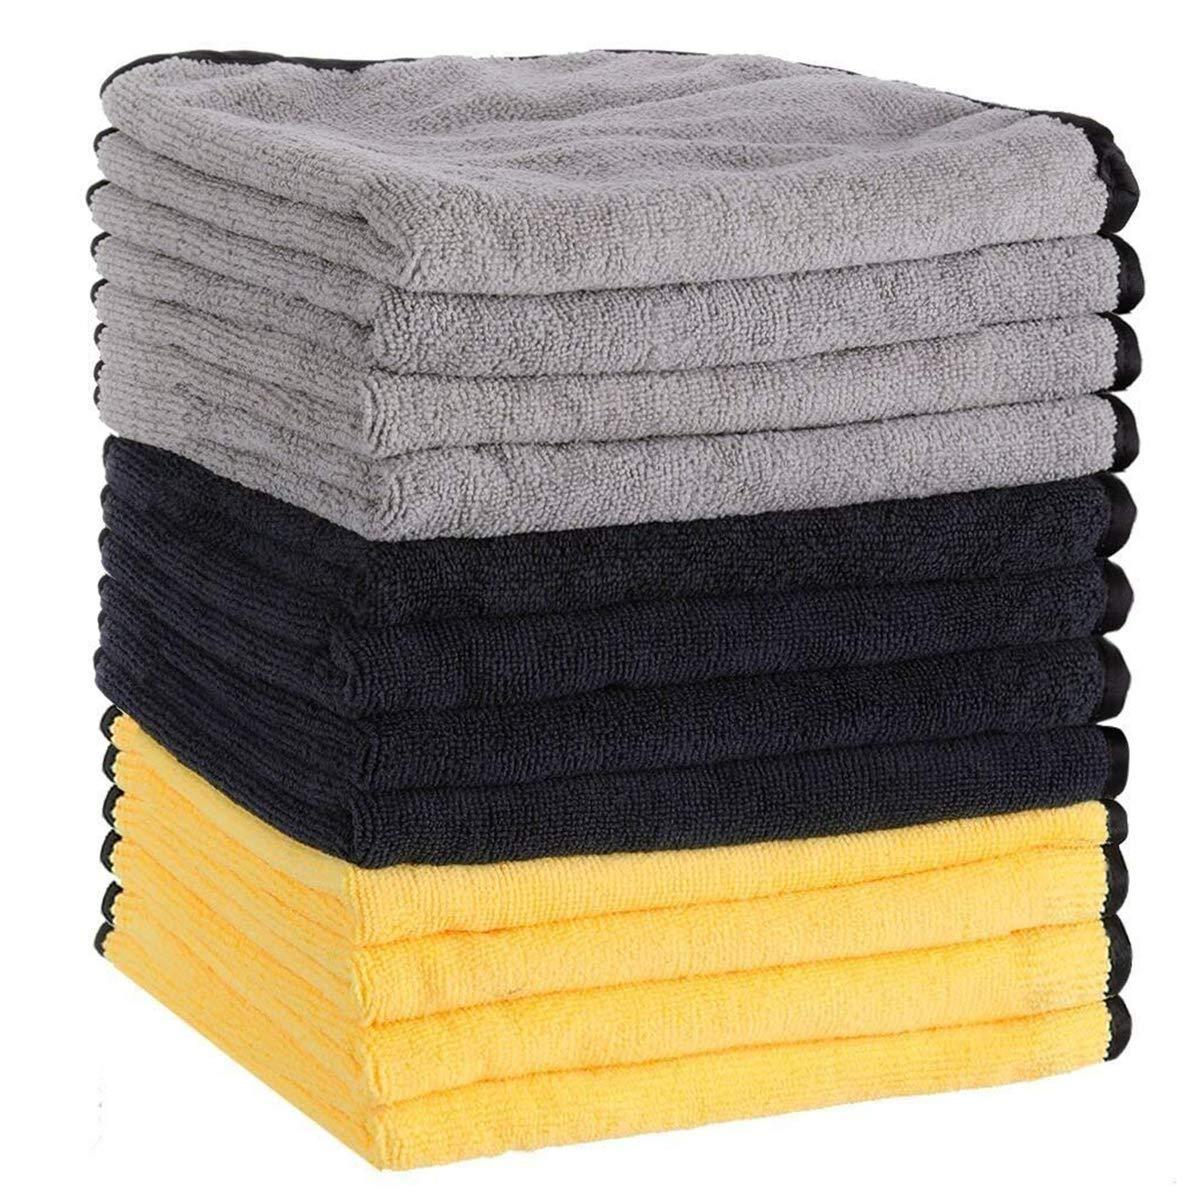 MATCC Microfiber Cleaning Cloths 12 Pack Premium Microfiber Towels for Cars Detailing Or Drying Towels for Cleaning Car Windows Dishes 16'' x 16'' by MATCC (Image #1)